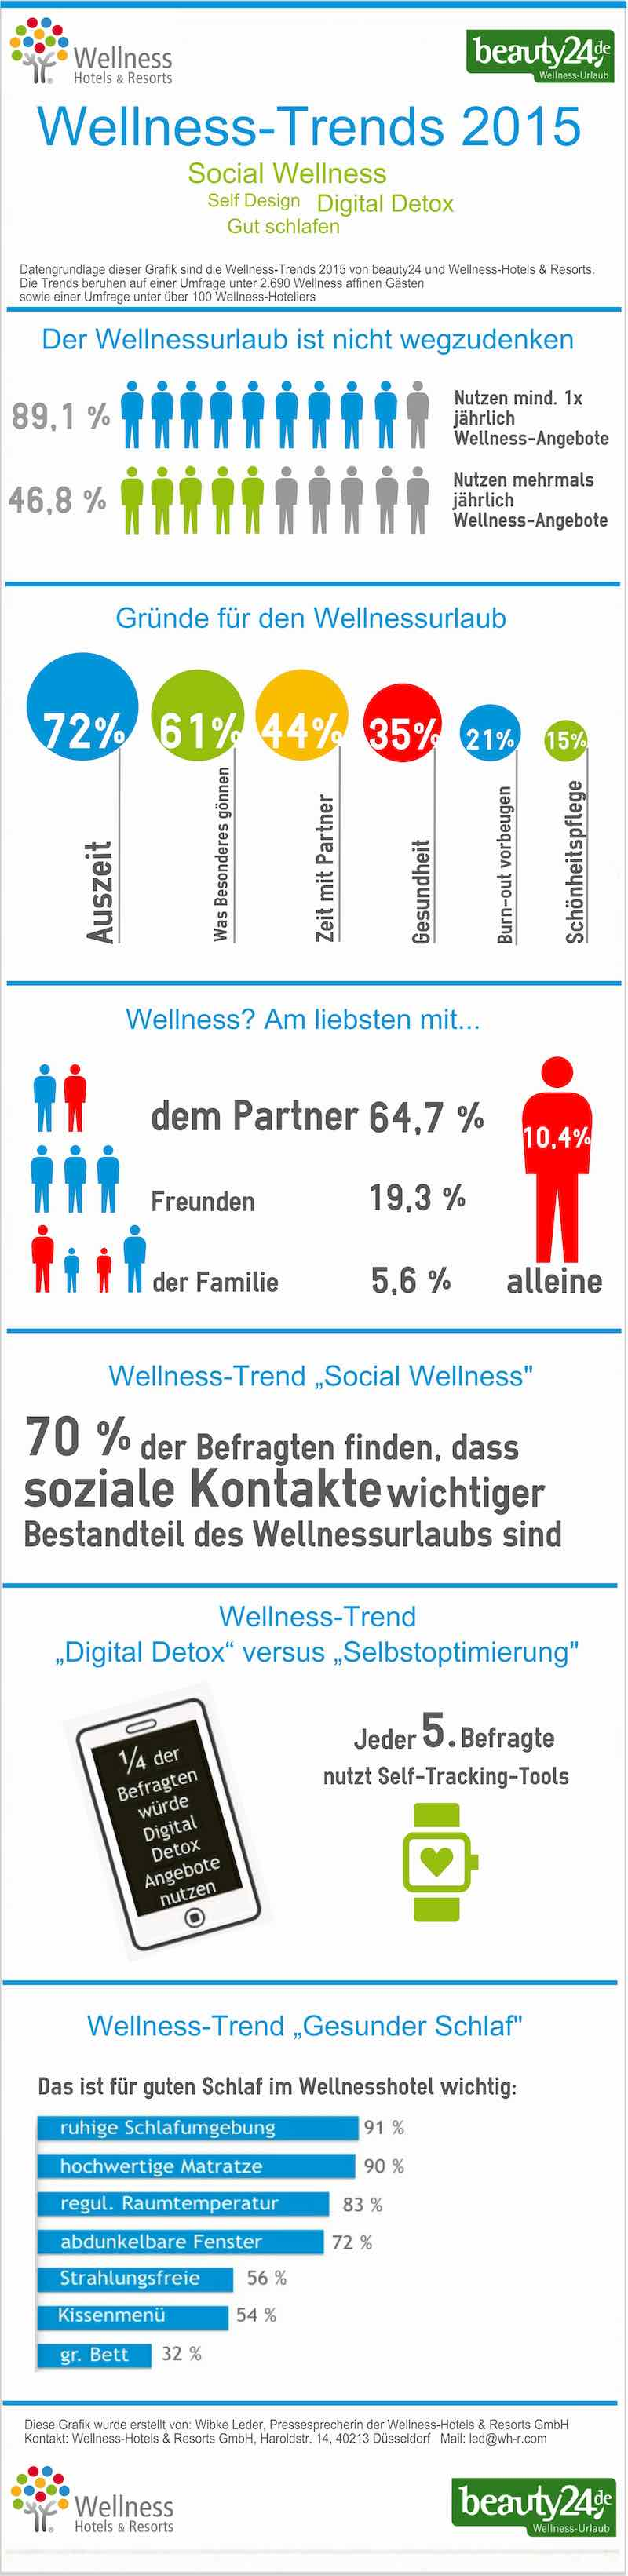 Wellness-Trends 2015